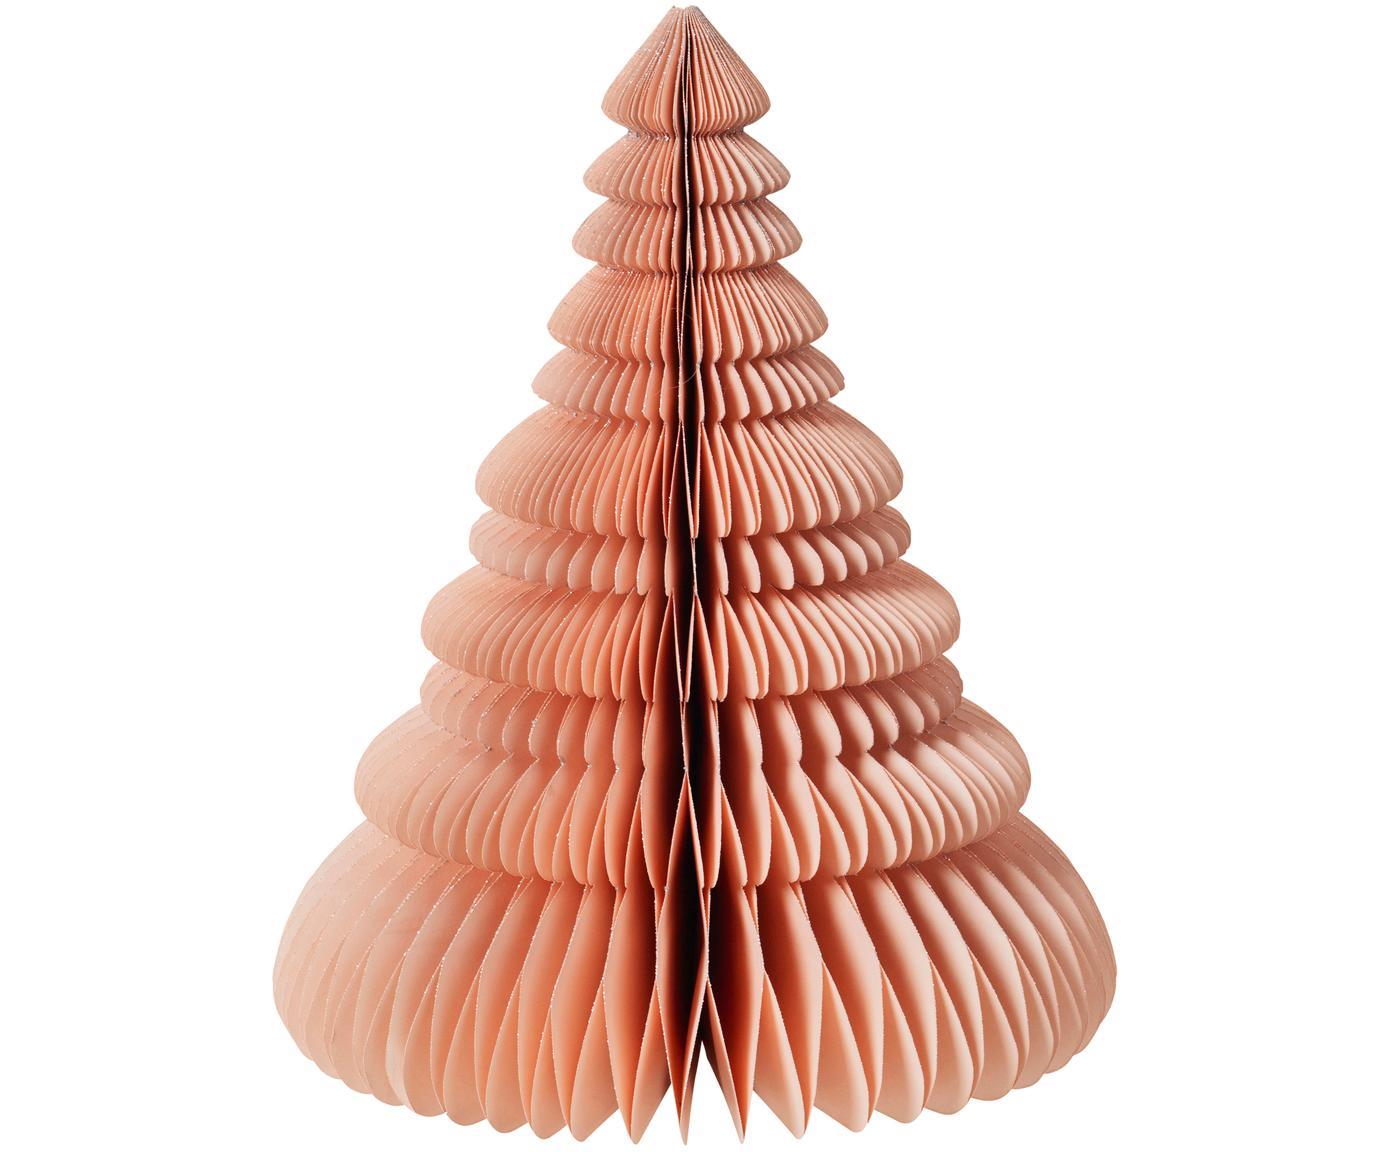 Deko-Objekt Paper Pine, Glitzerpapier, Altrosa, Ø 37 x H 45 cm